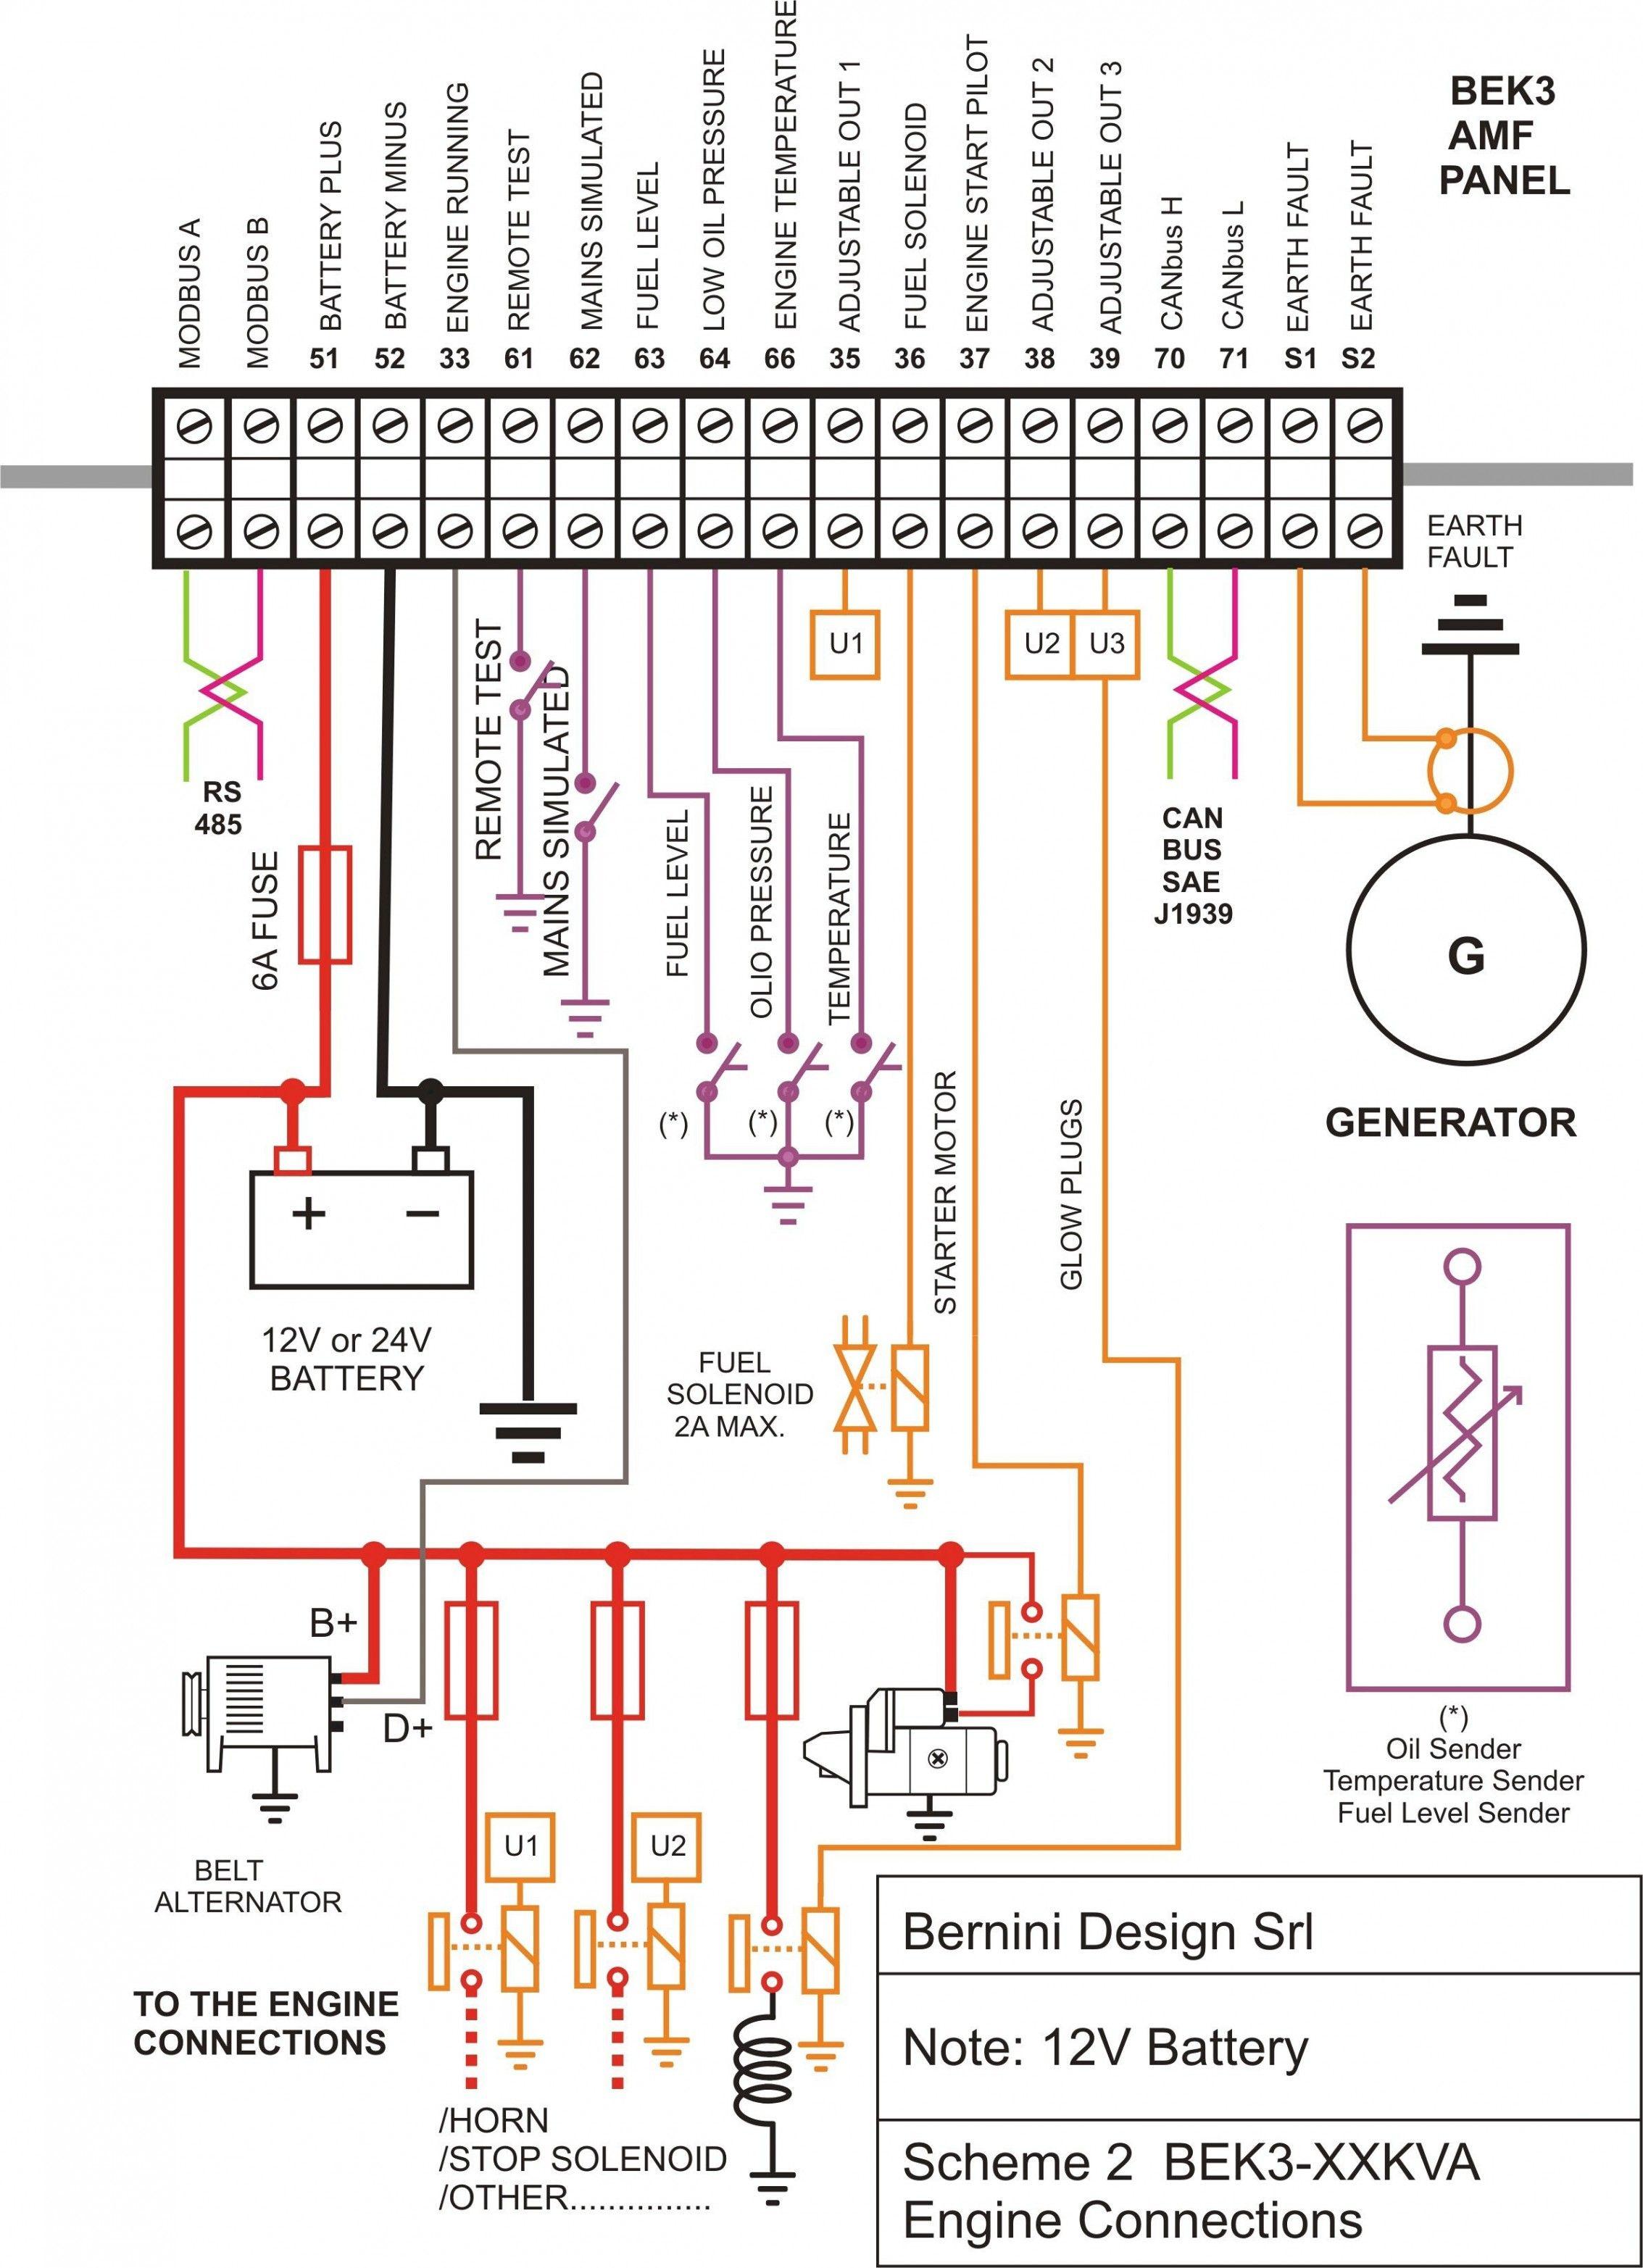 25 Good Wiring Diagram Software Technique Https Bacamajalah Com 25 Good Wiring Diagram S Electrical Circuit Diagram Electrical Panel Wiring Circuit Diagram